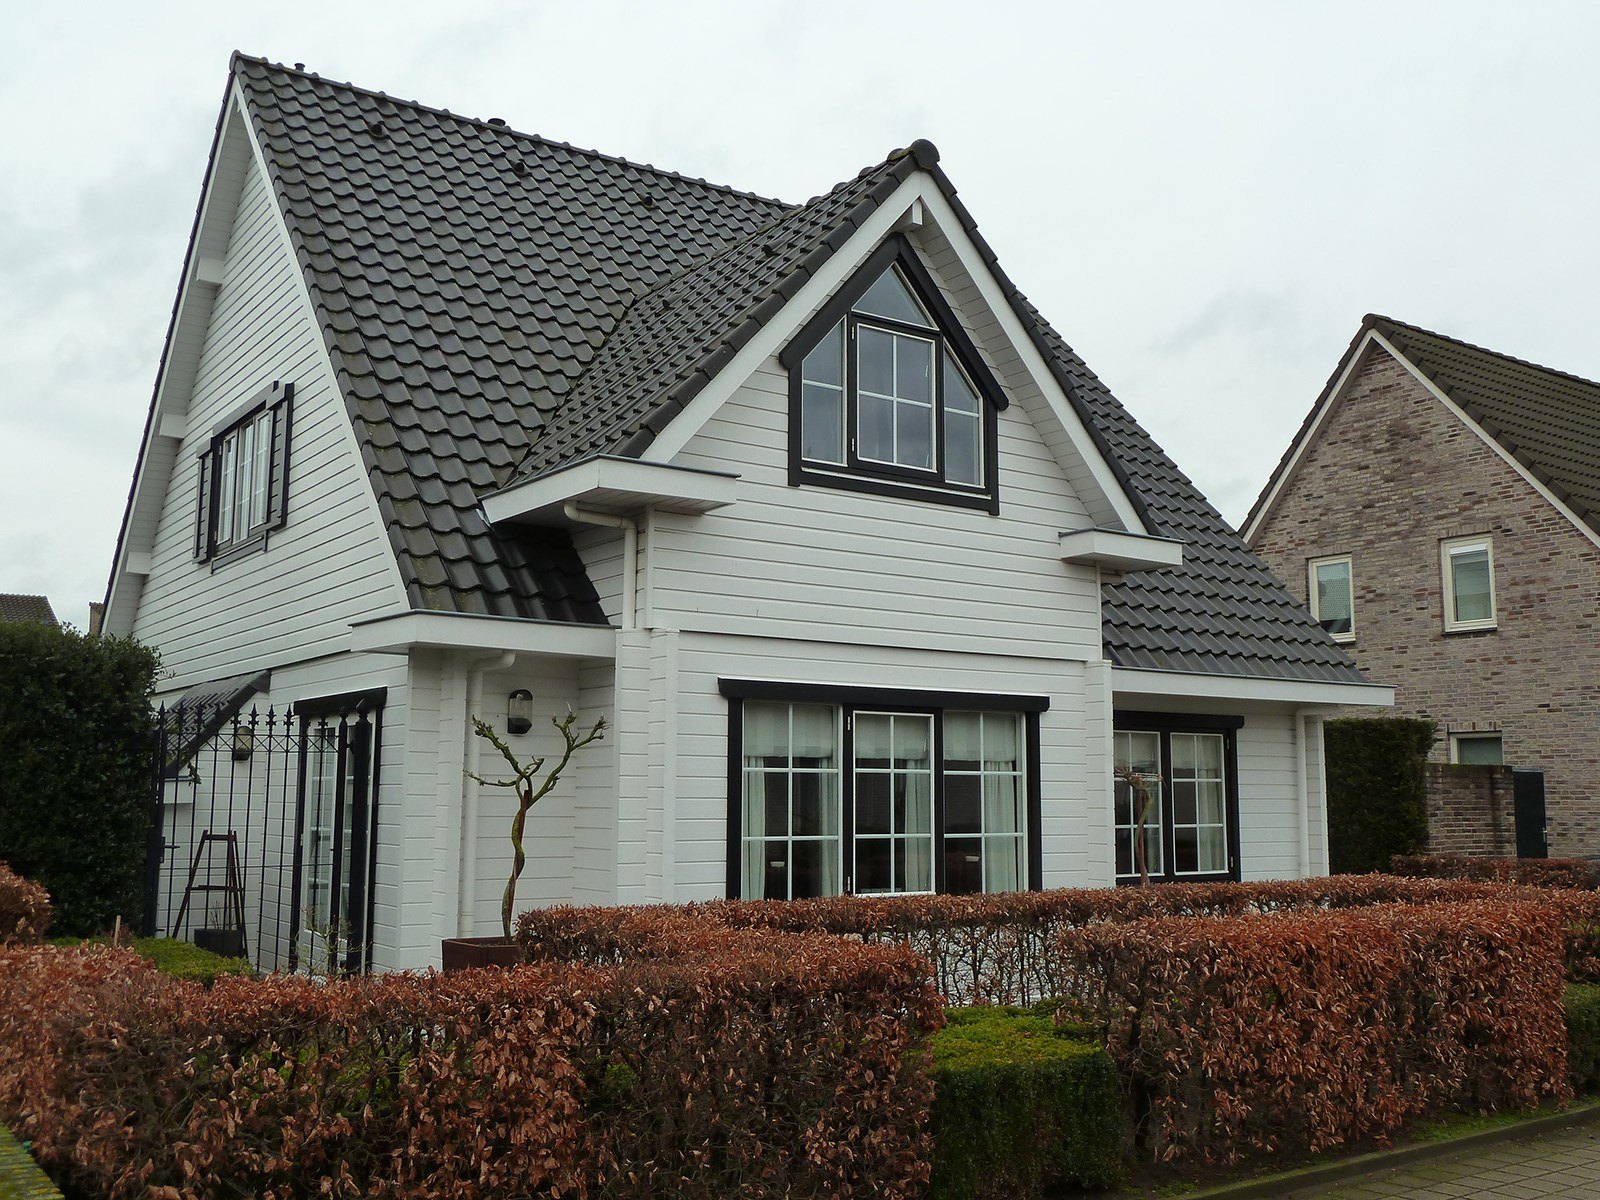 Home finnlogs houtbouw bv - Mode stijl amerikaans ...